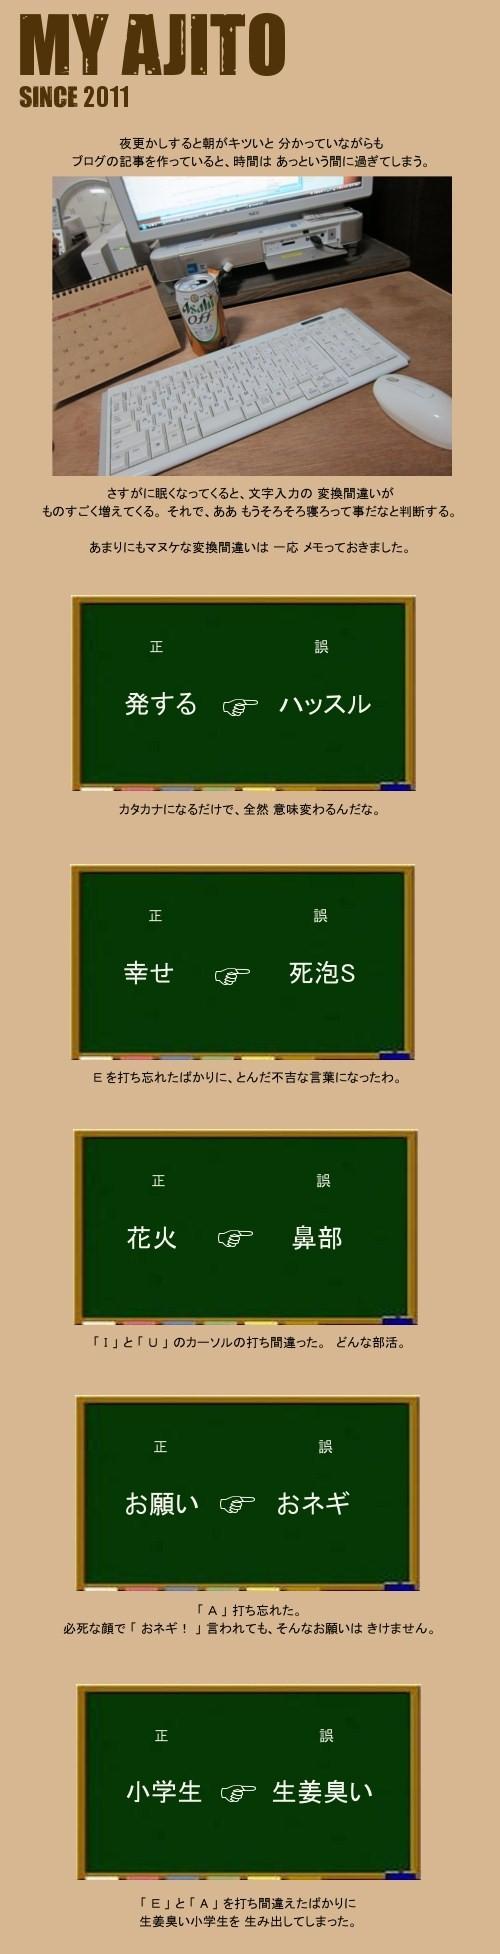 namaju_01.jpg